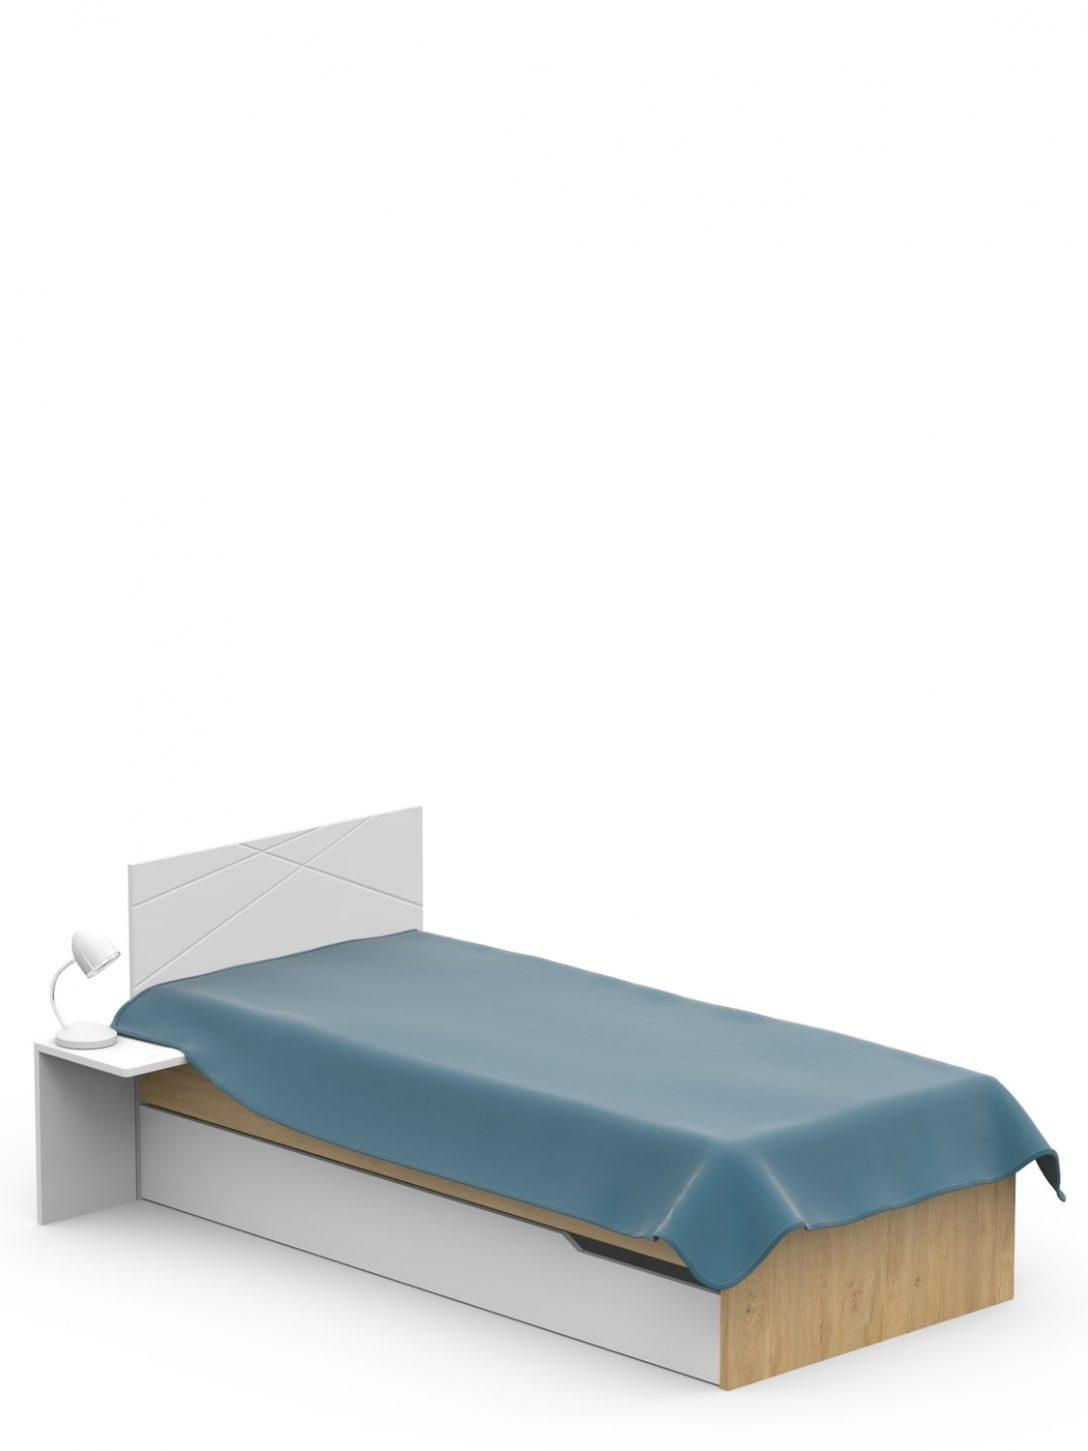 Large Size of Bett 120x200 Mit Matratze Und Lattenrost Oak Meblik Betten 140x200 Günstig Kaufen Kolonialstil Treca Singleküche Kühlschrank Flach Schlicht Einbauküche E Bett Bett 120x200 Mit Matratze Und Lattenrost